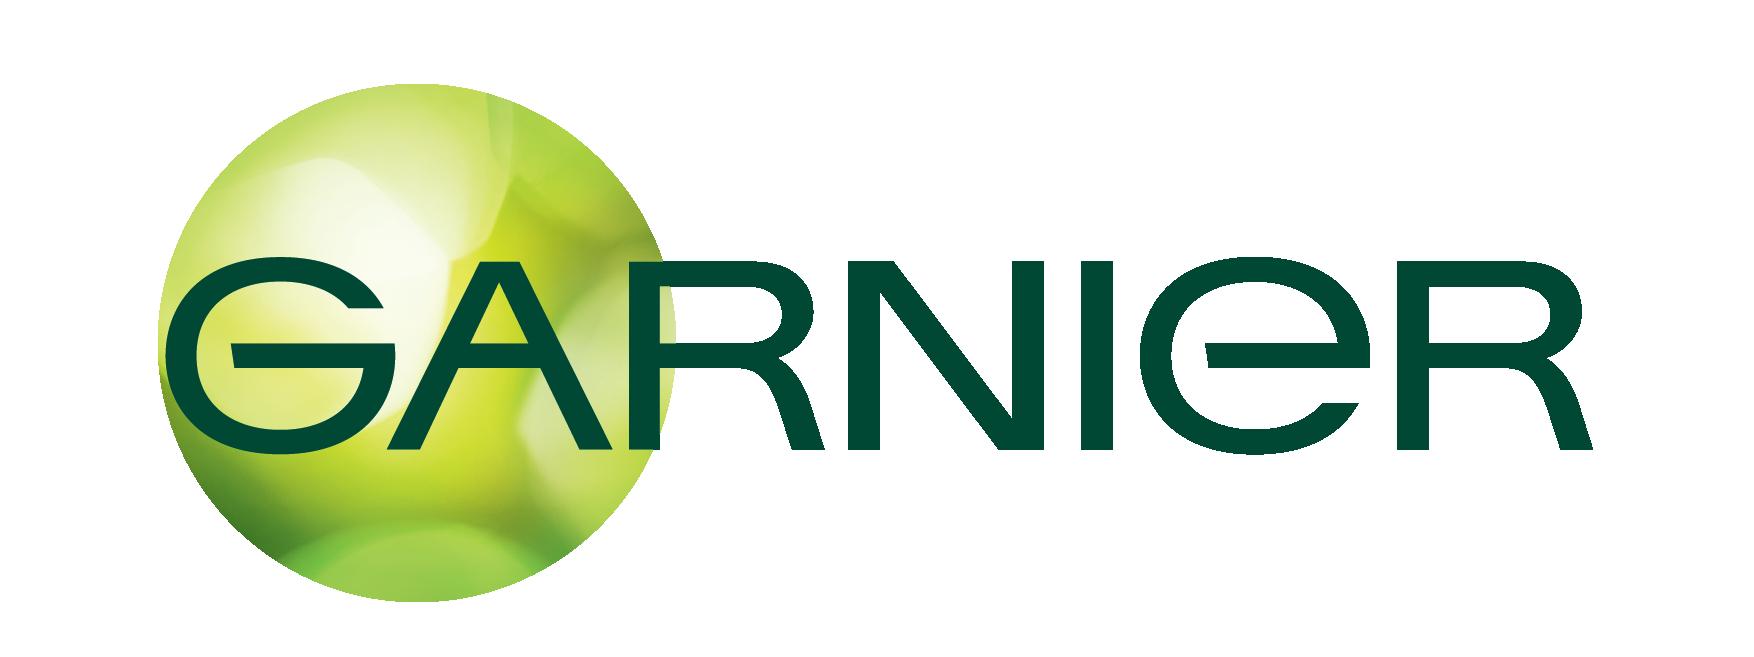 Fichier:Garnier (logo 4).png — Wikipédia.